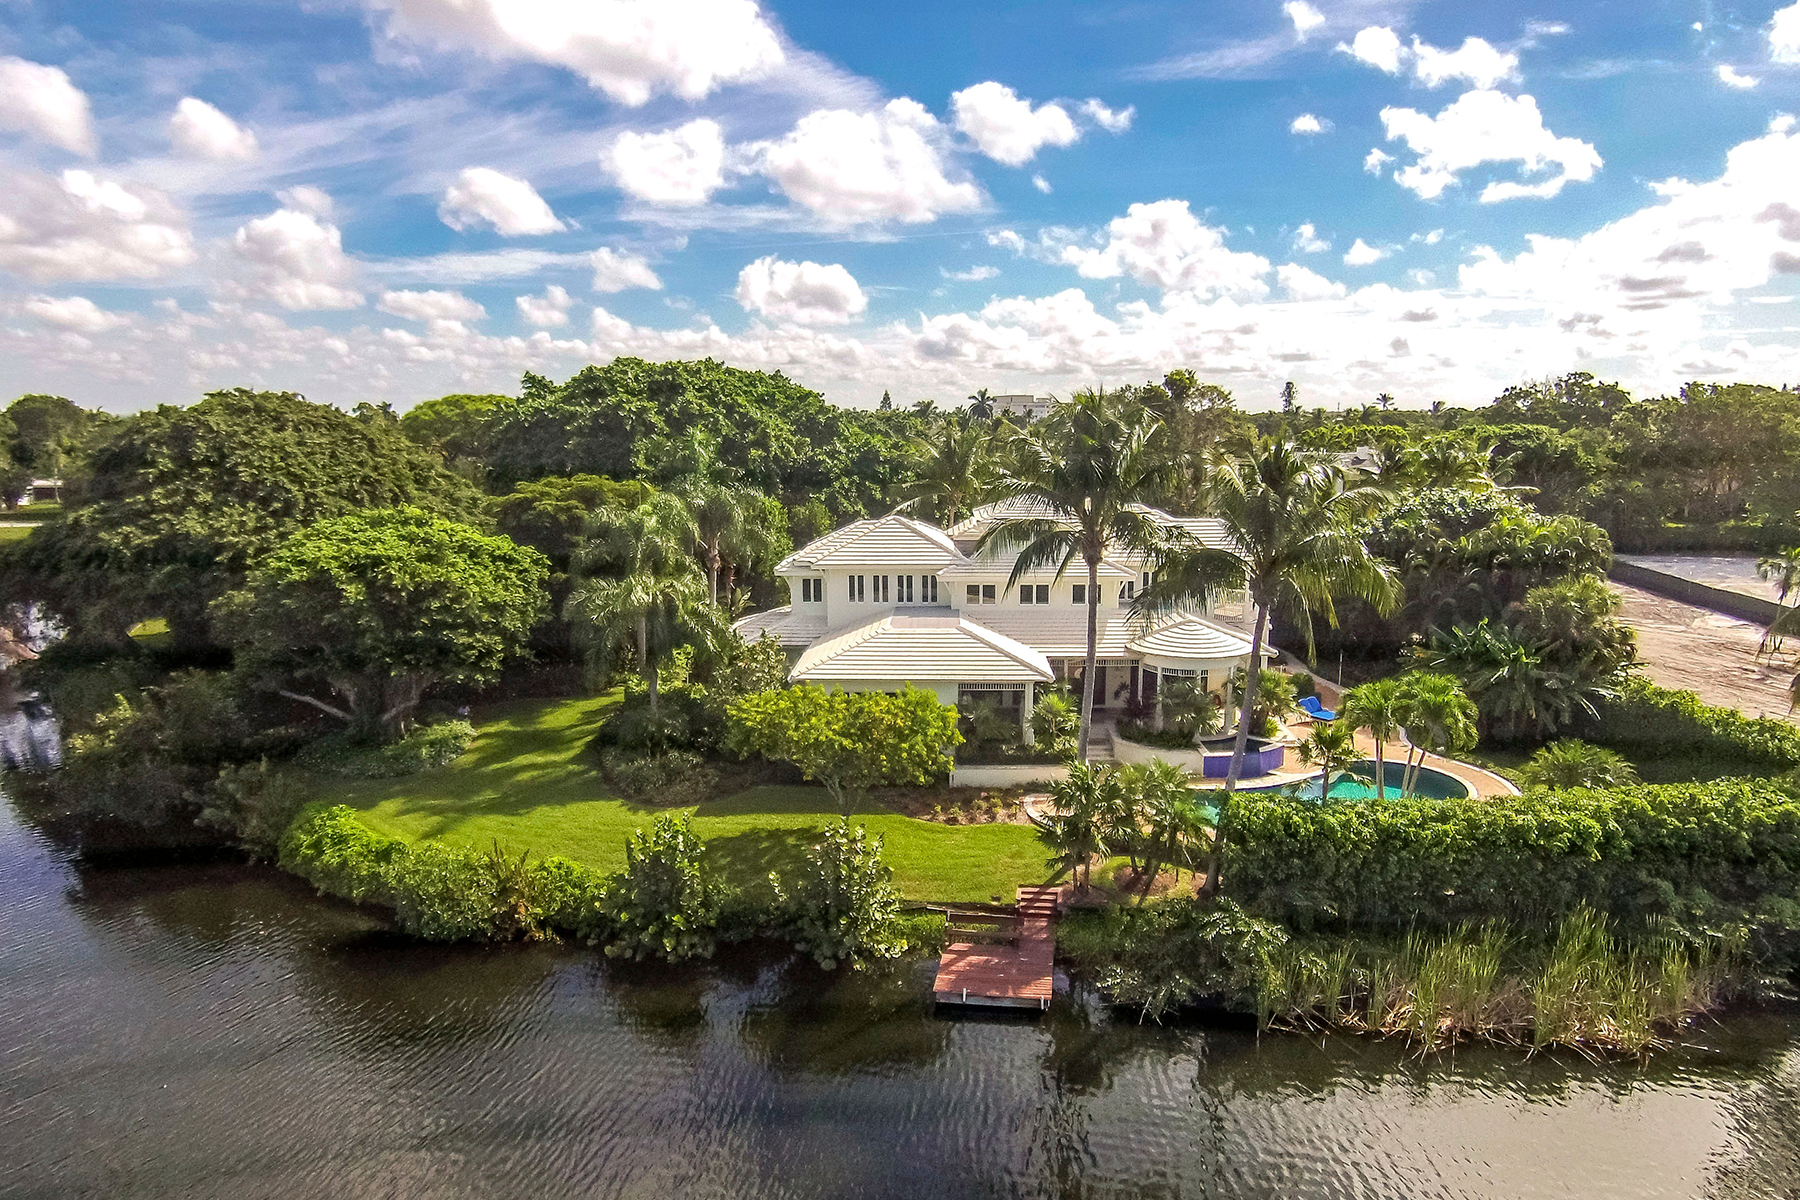 Villa per Vendita alle ore OLDE NAPLES 575 3rd St N Naples, Florida, 34102 Stati Uniti